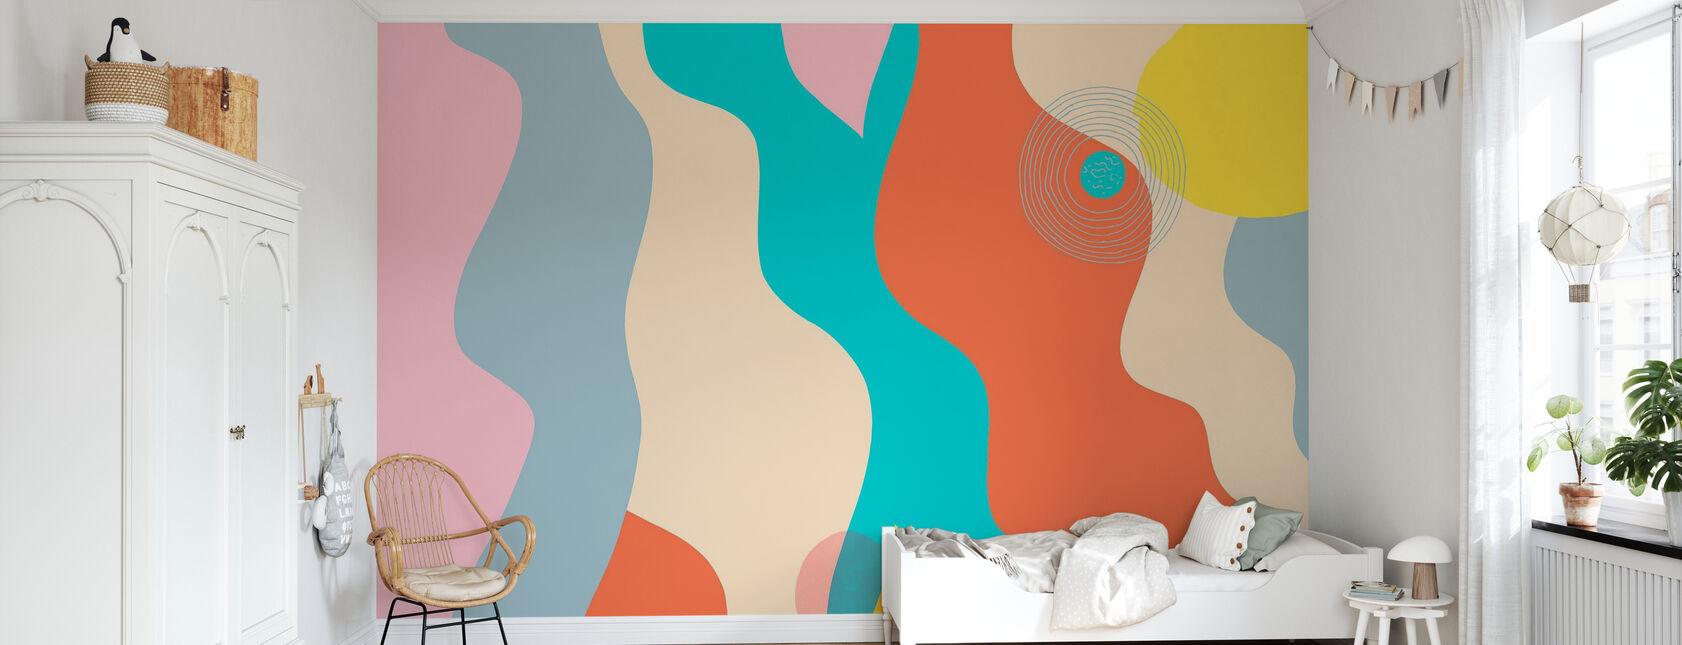 Space - Wallpaper - Kids Room